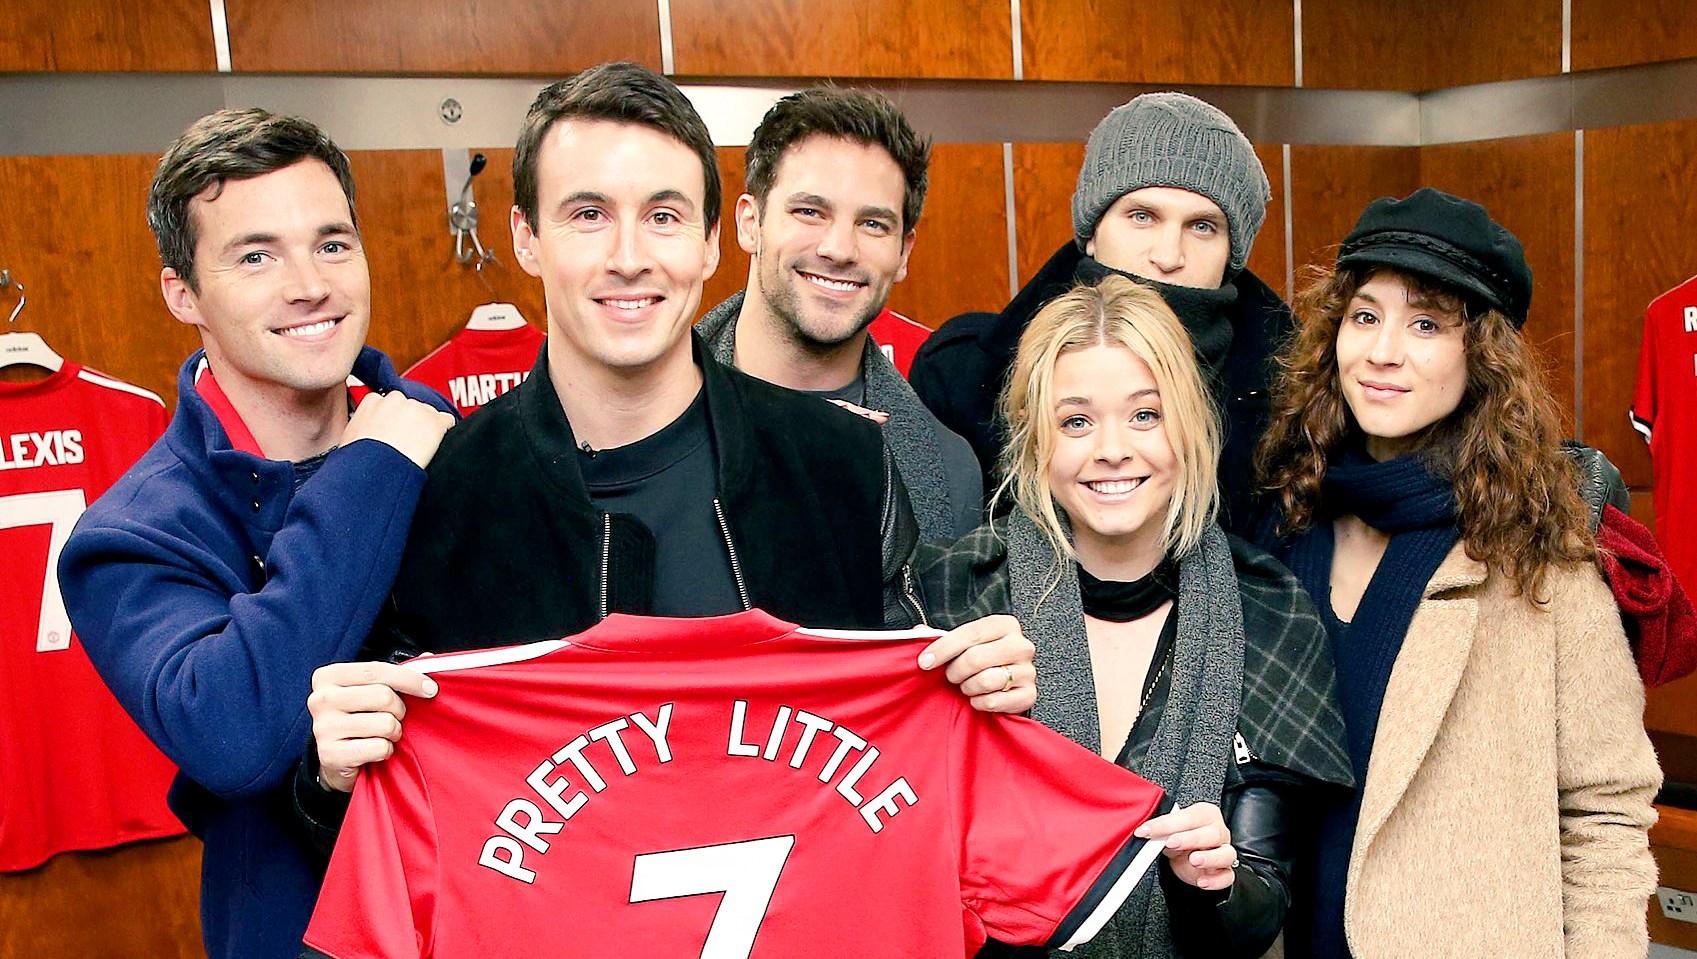 'Pretty Little Liars' cast reunites